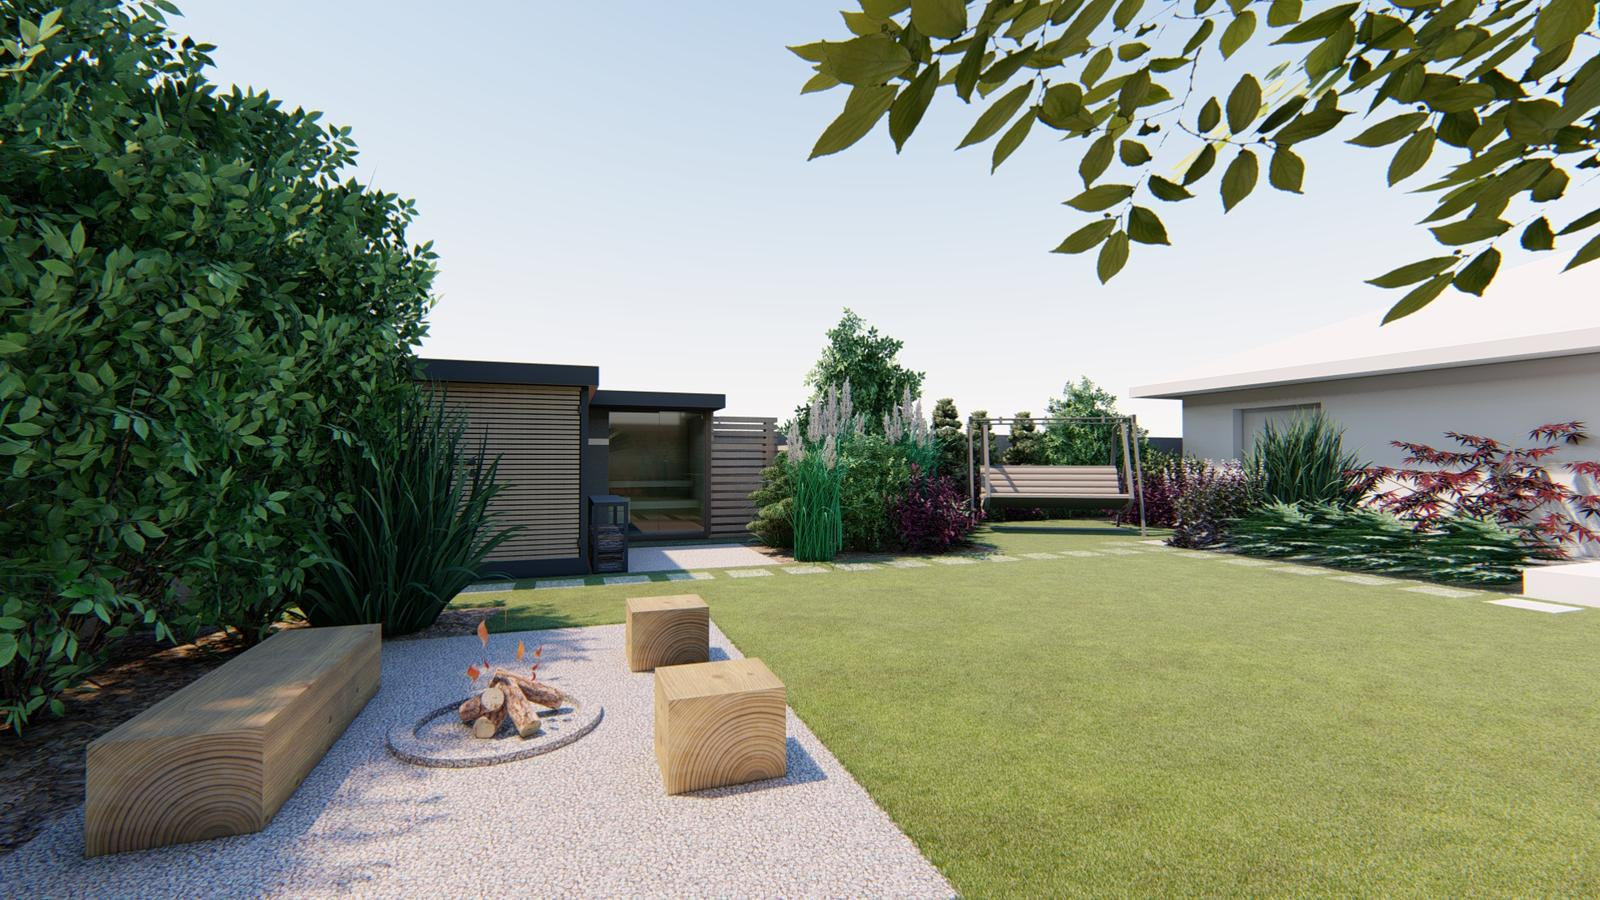 Návrh záhrady rodinného domu - Obrázok č. 27